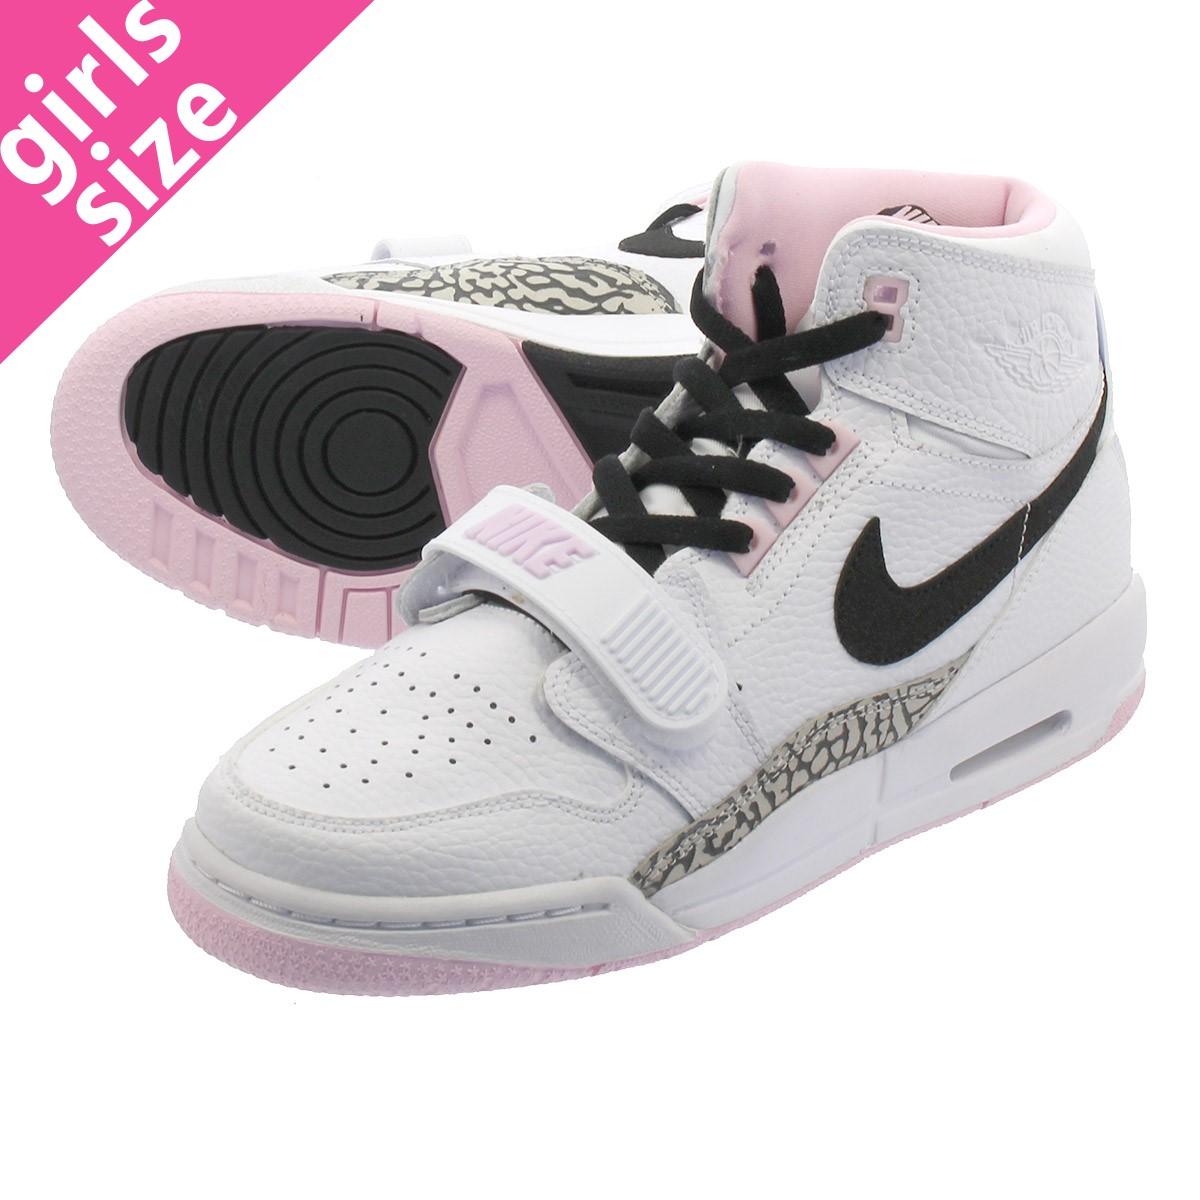 best service 2d999 fdcd3 NIKE AIR JORDAN LEGACY 312 GS Nike Air Jordan Legacy 312 GS WHITE BLACK  ...